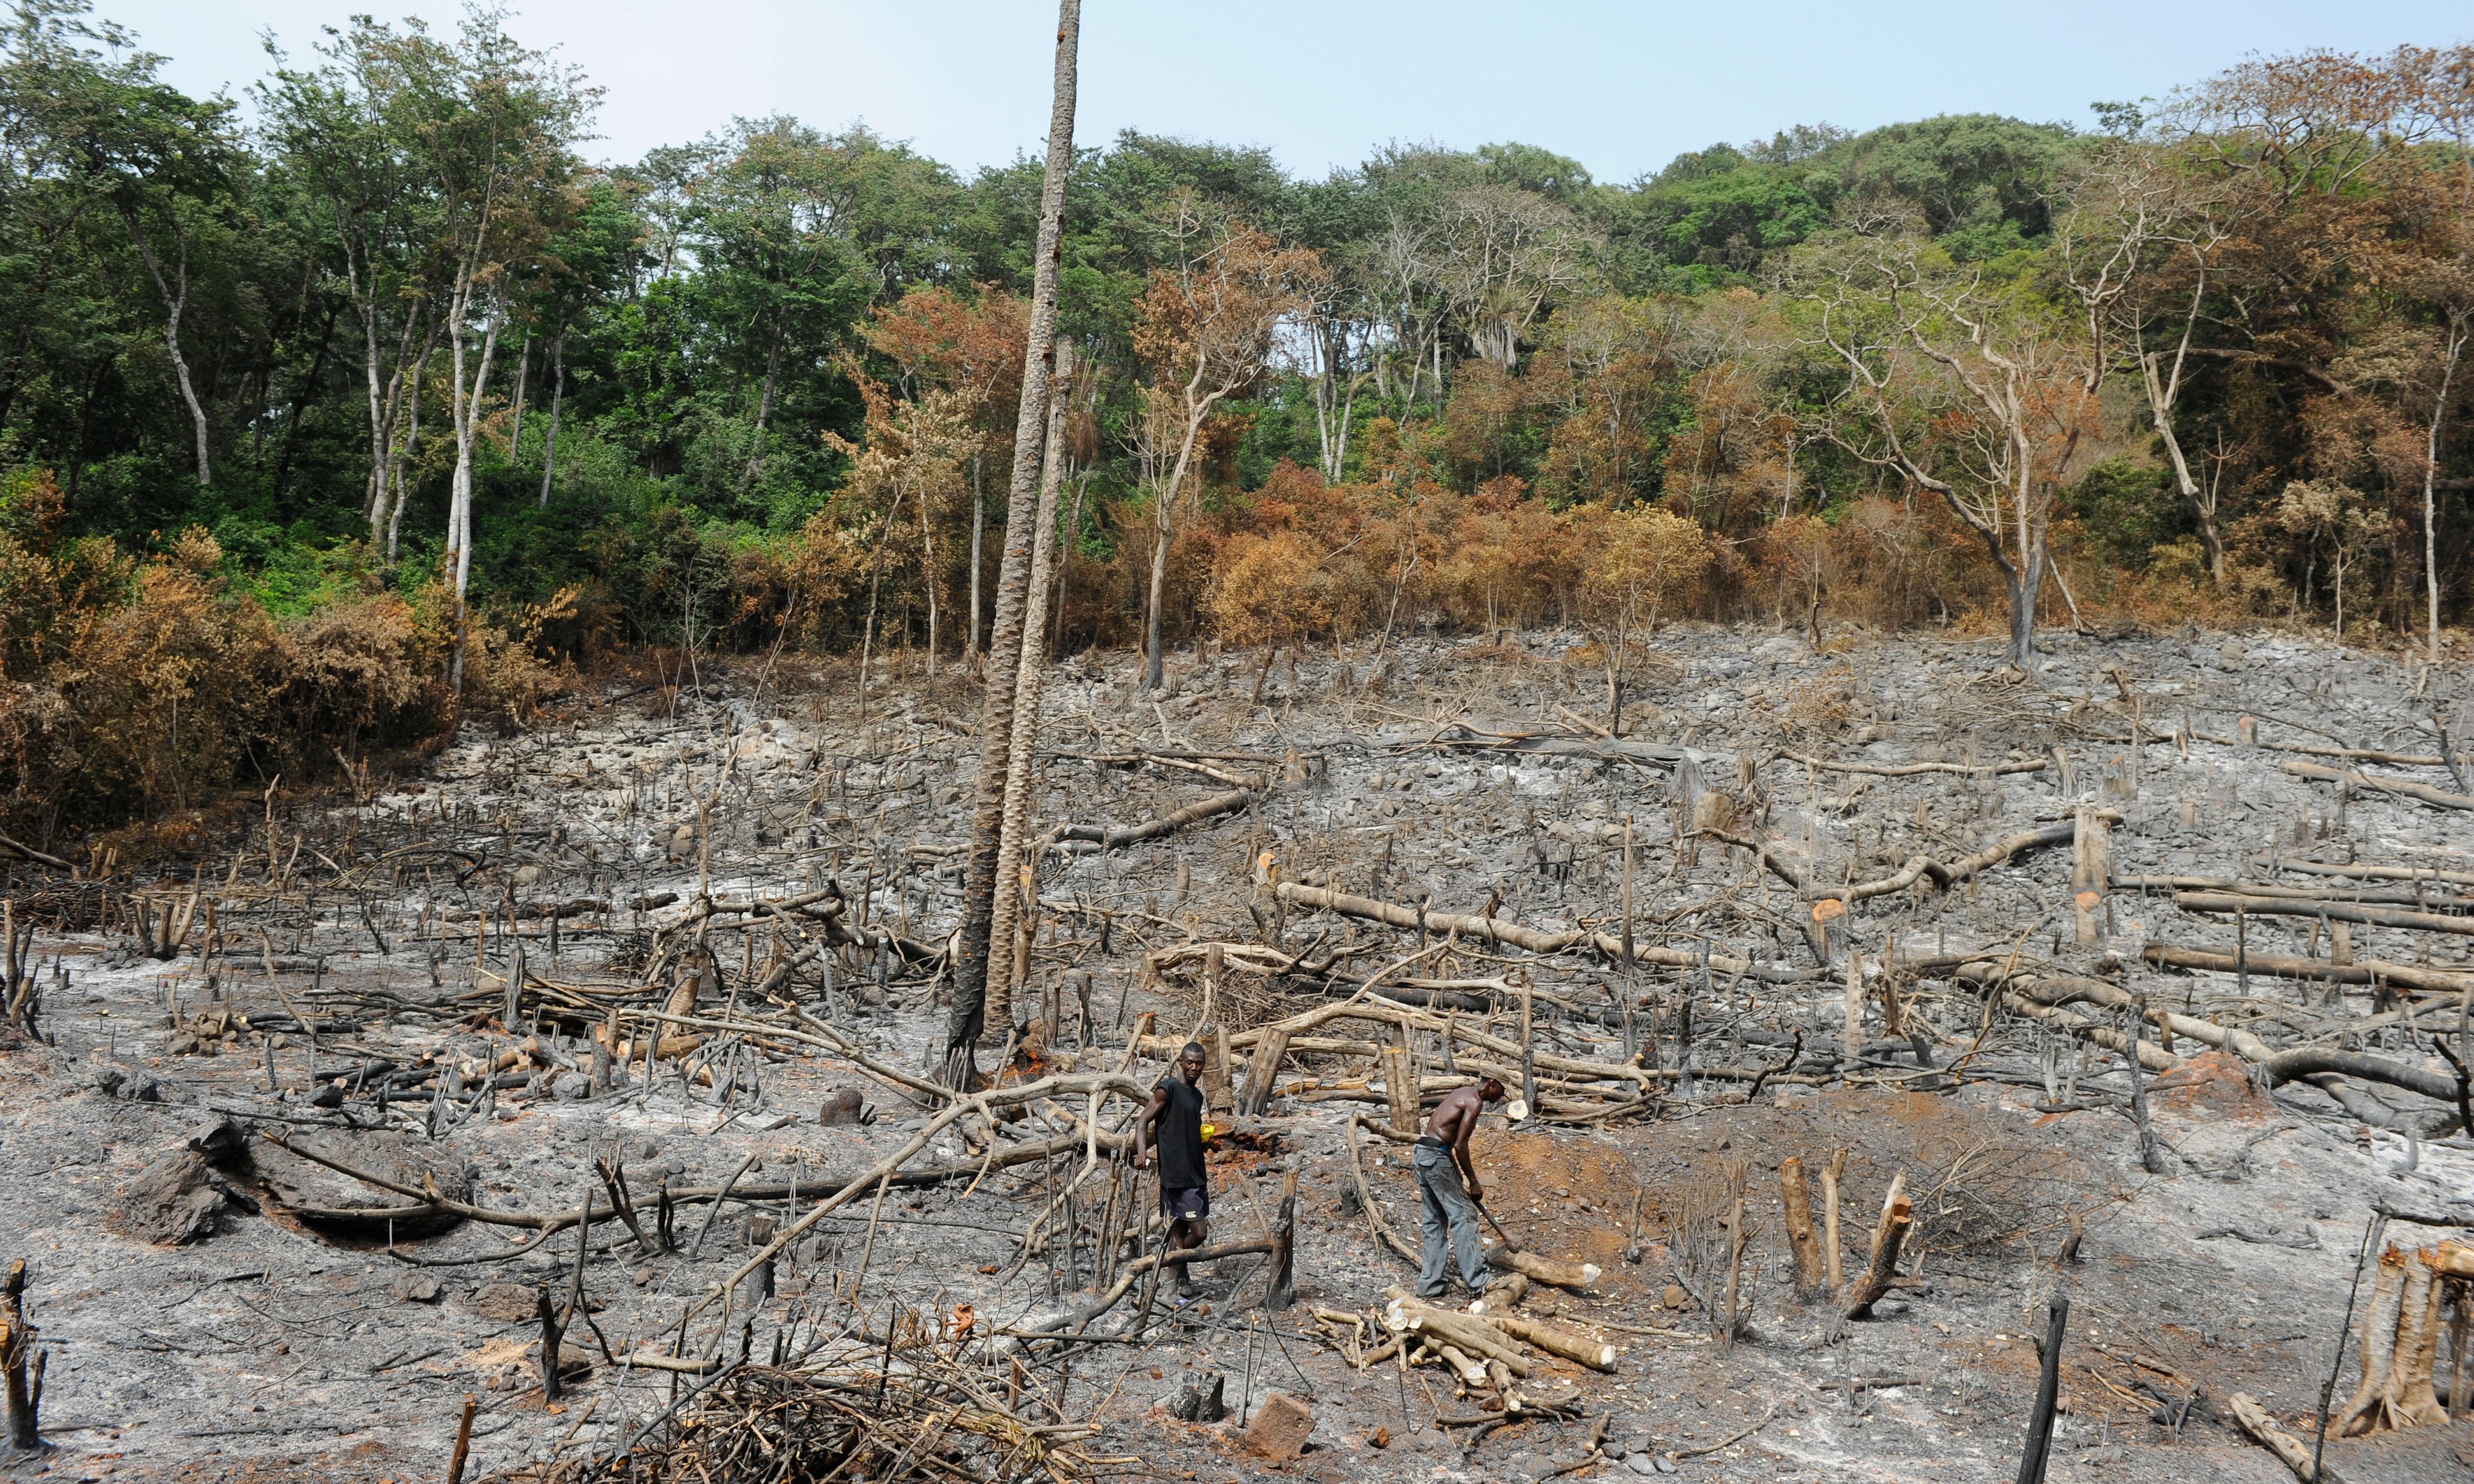 Deforestation damage goes far beyond the Amazon